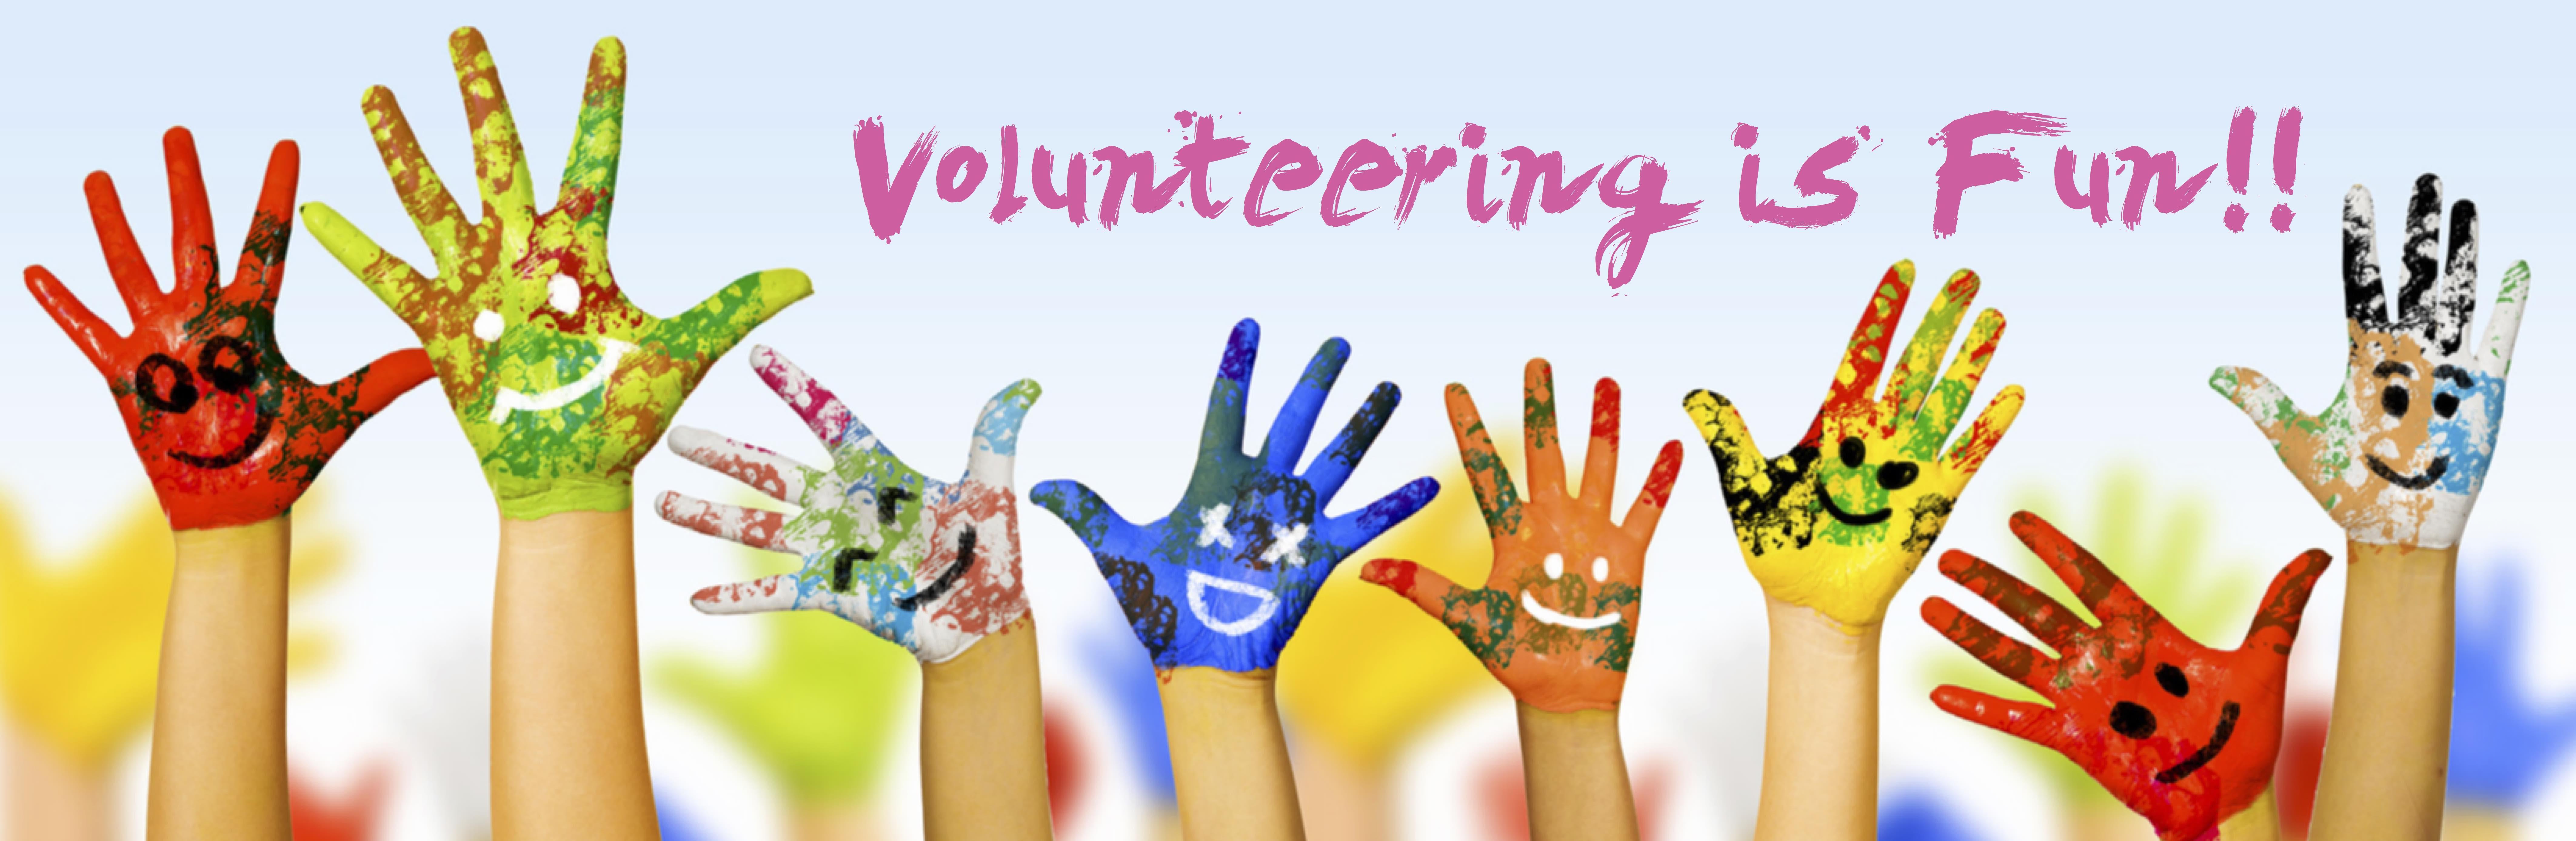 volunteering is fun painted hands concept z home property